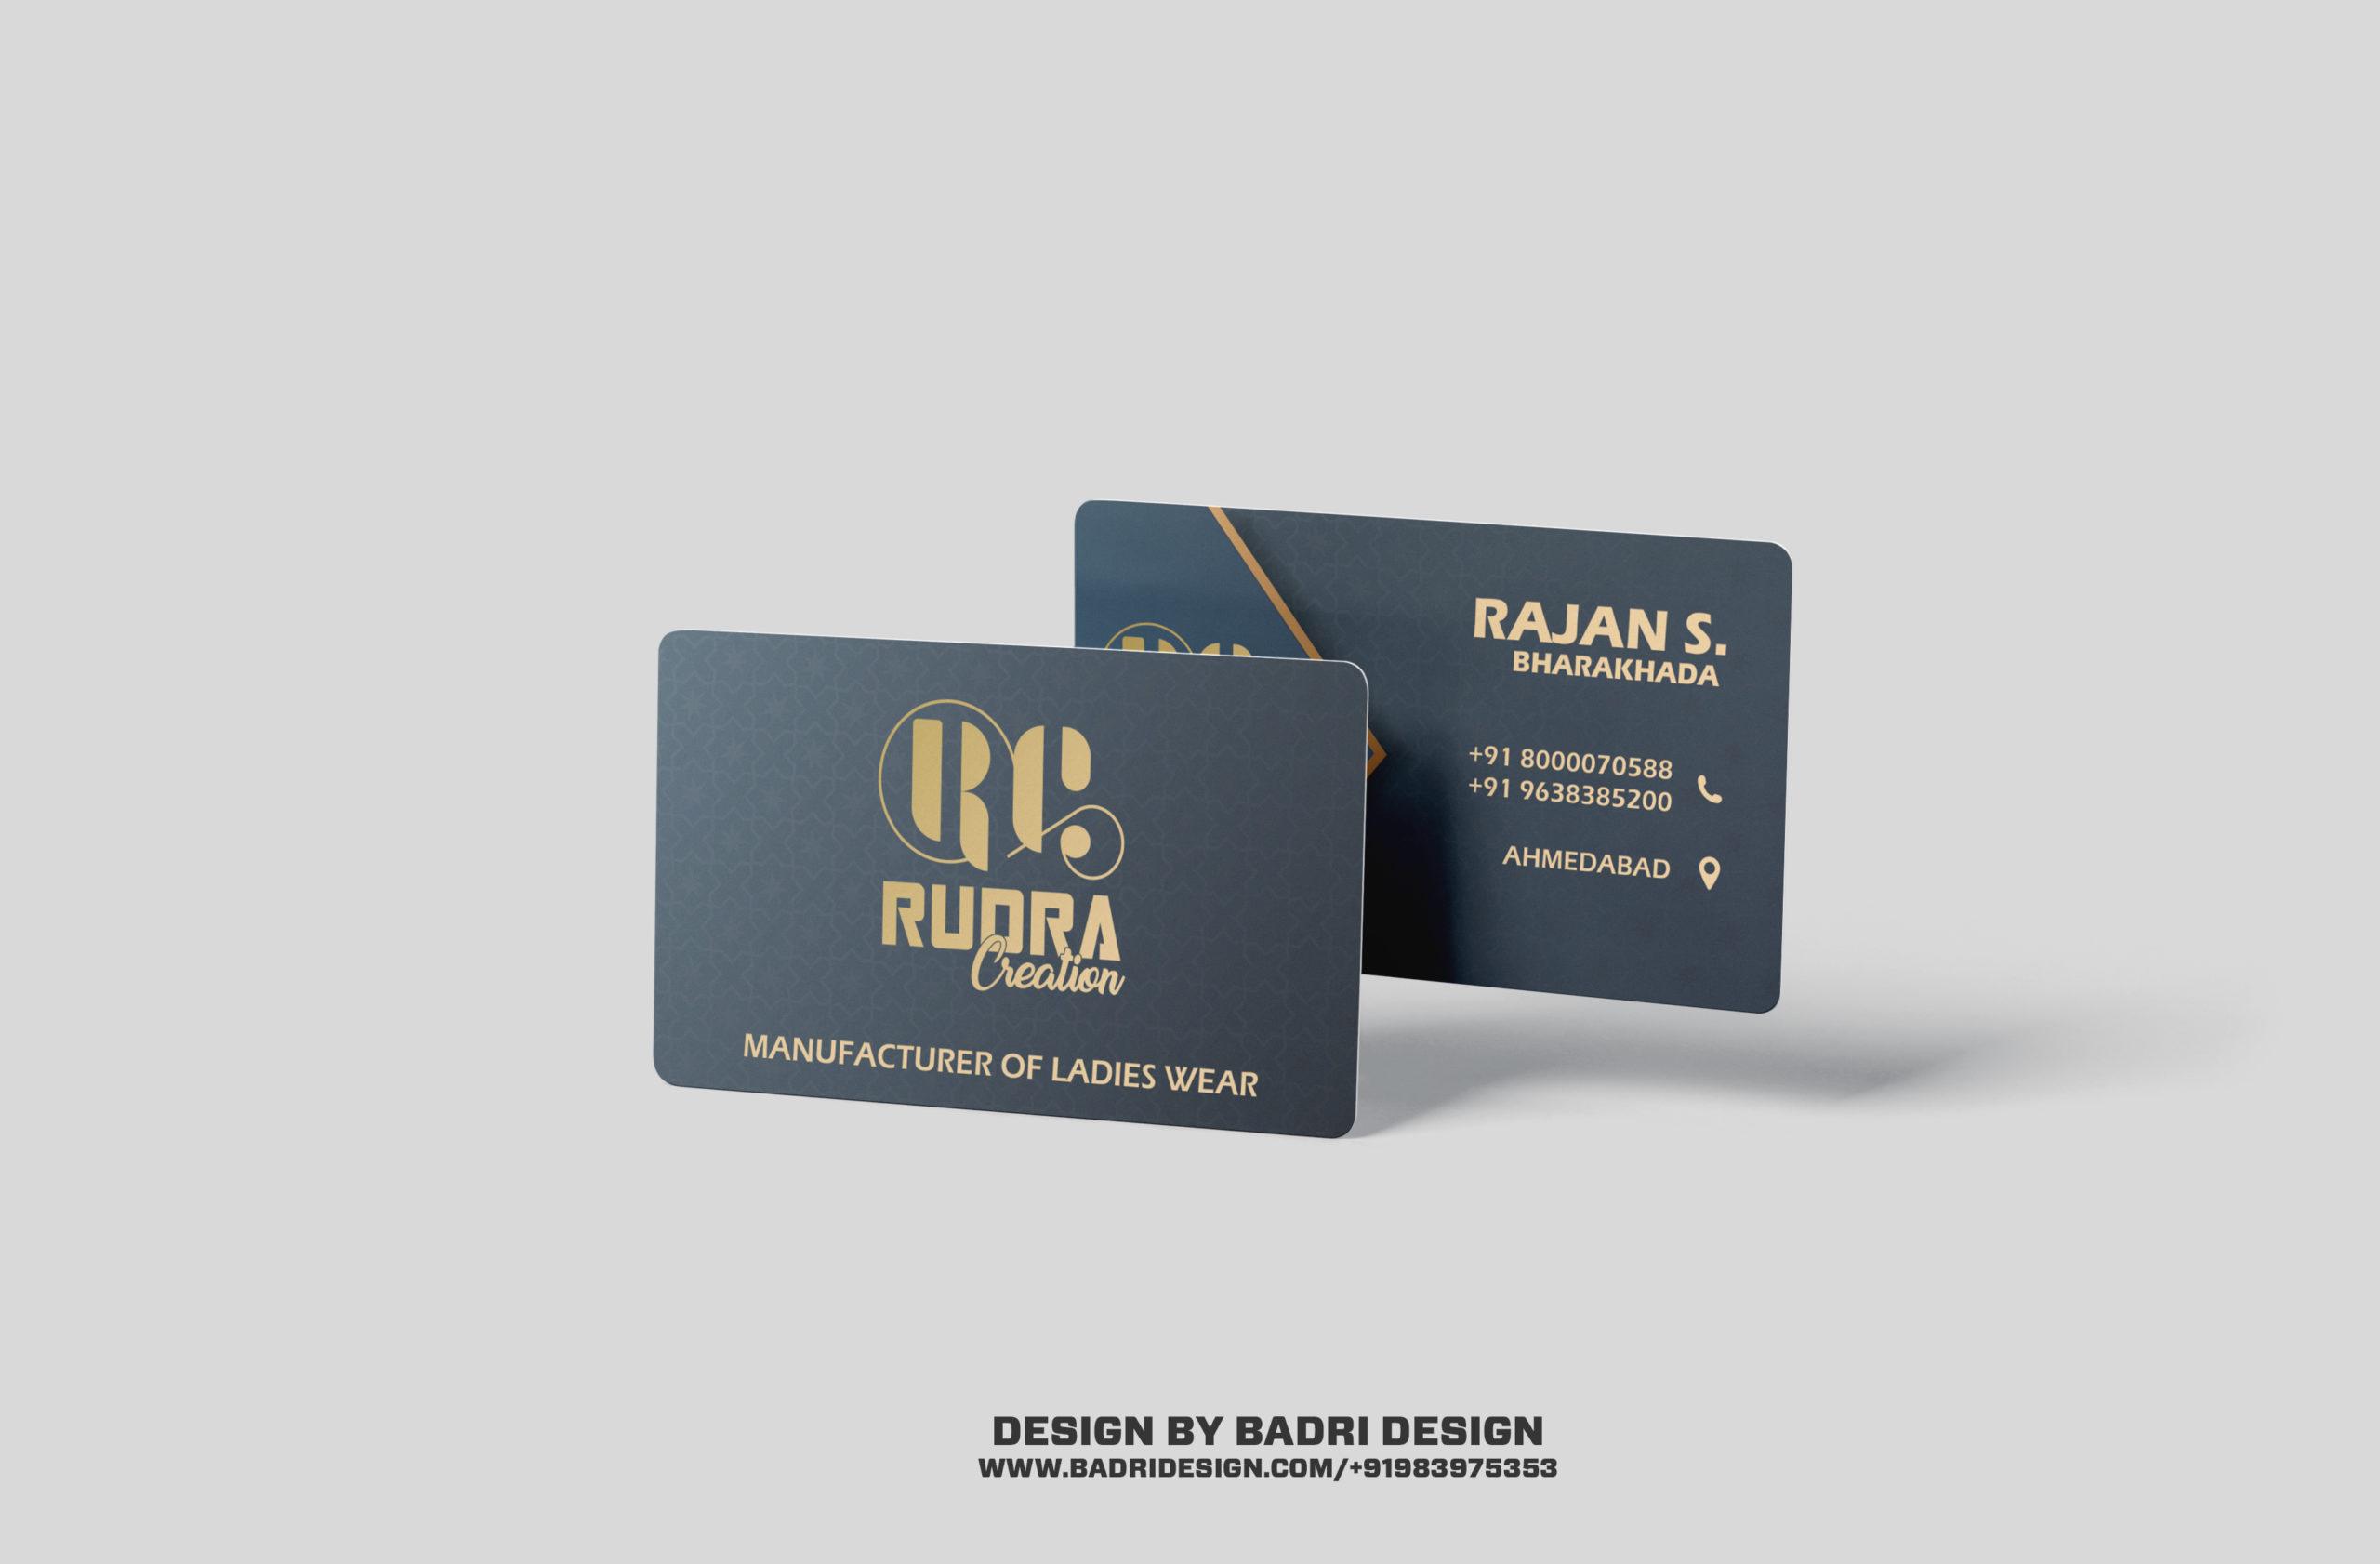 Rudra creation garment shop business card design by Badri Design